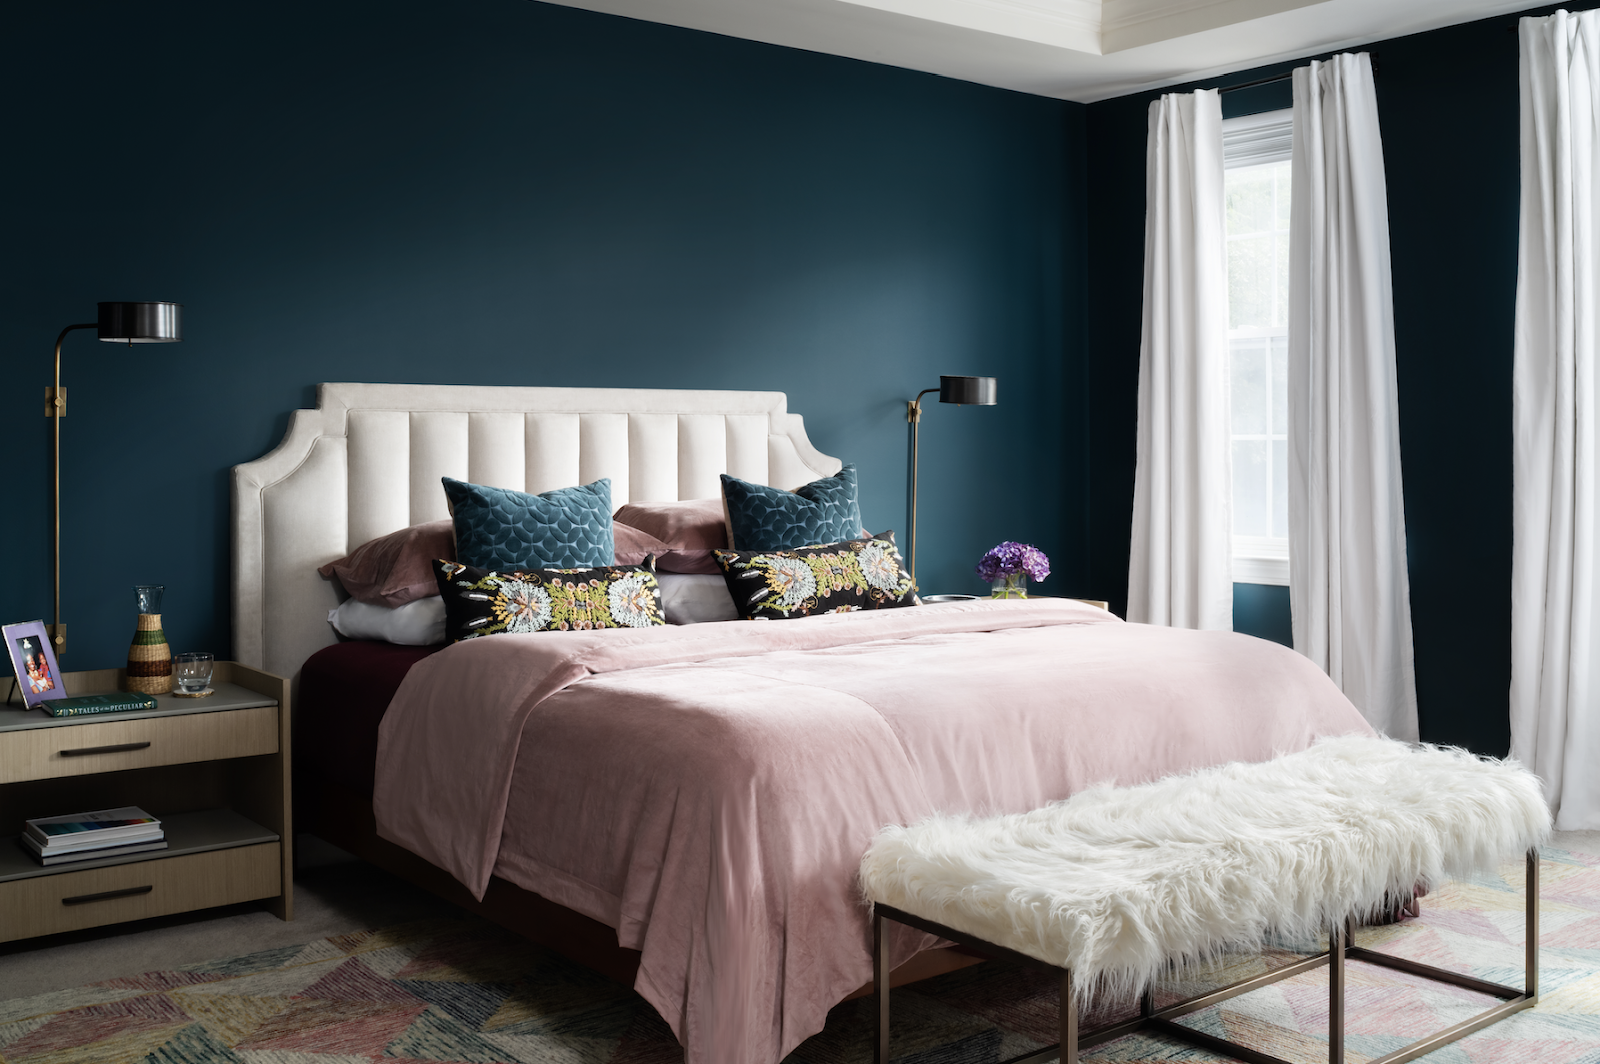 principal bedroom cream headboard white curtains ceiling teal walls joy street initiative